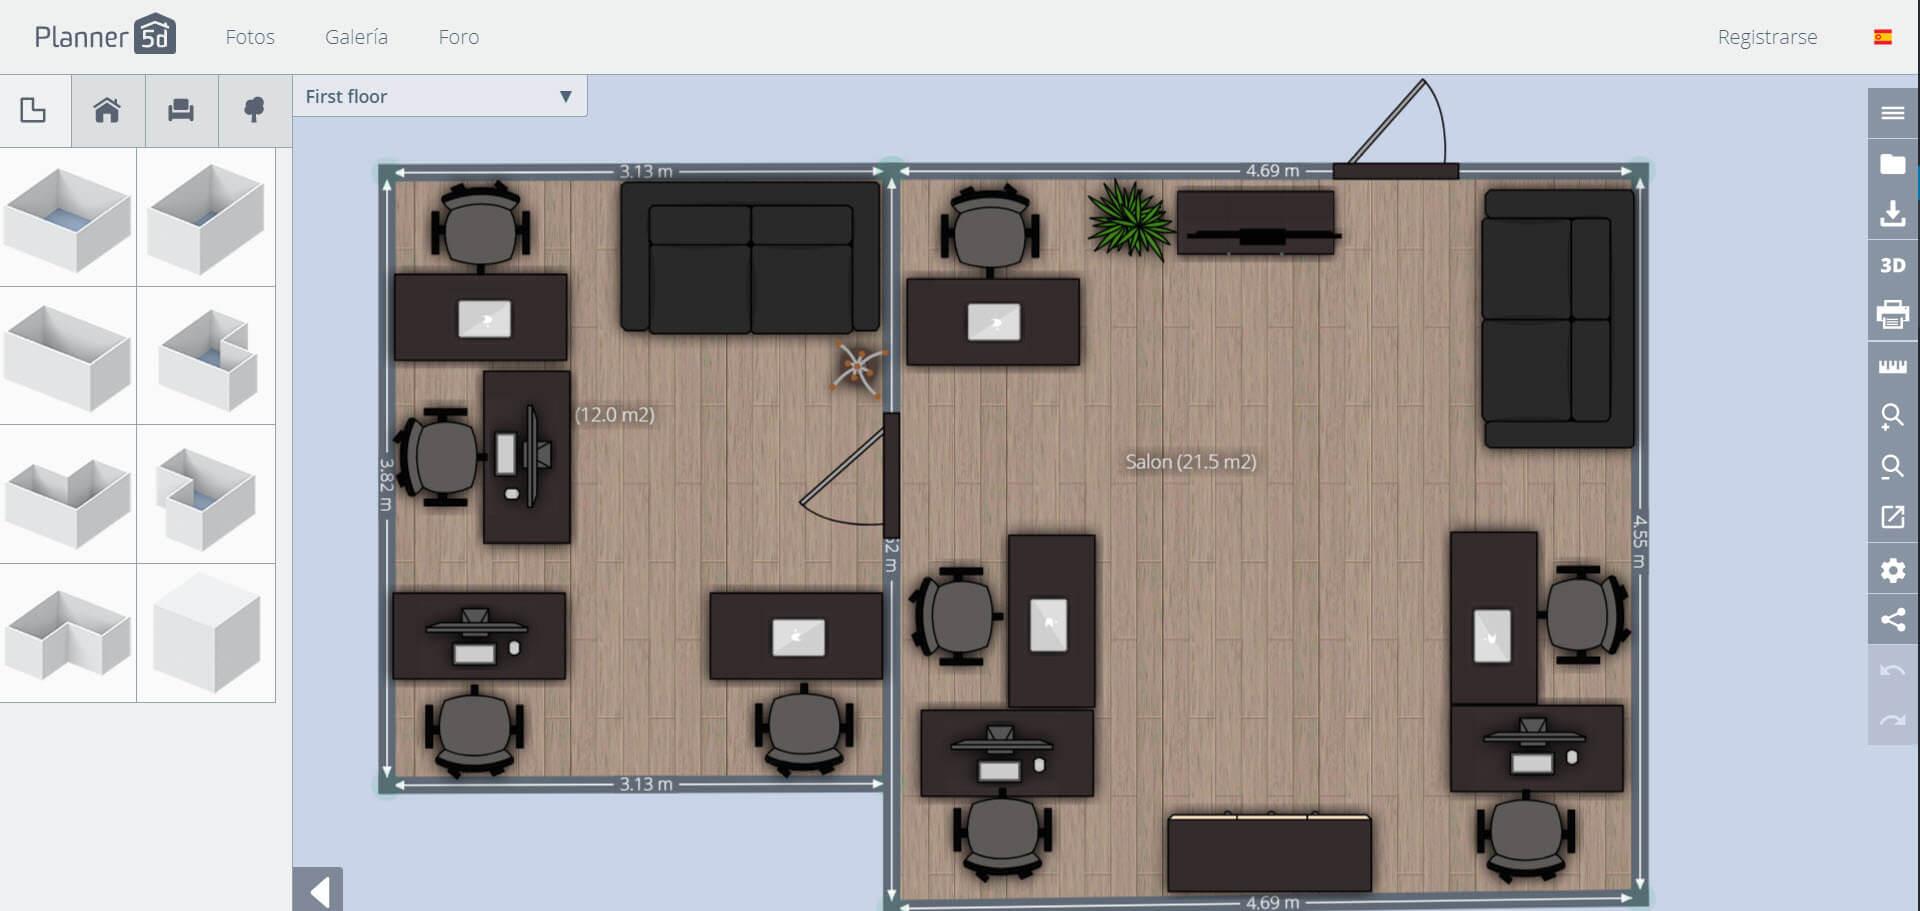 Planner5D app - design of house plans online